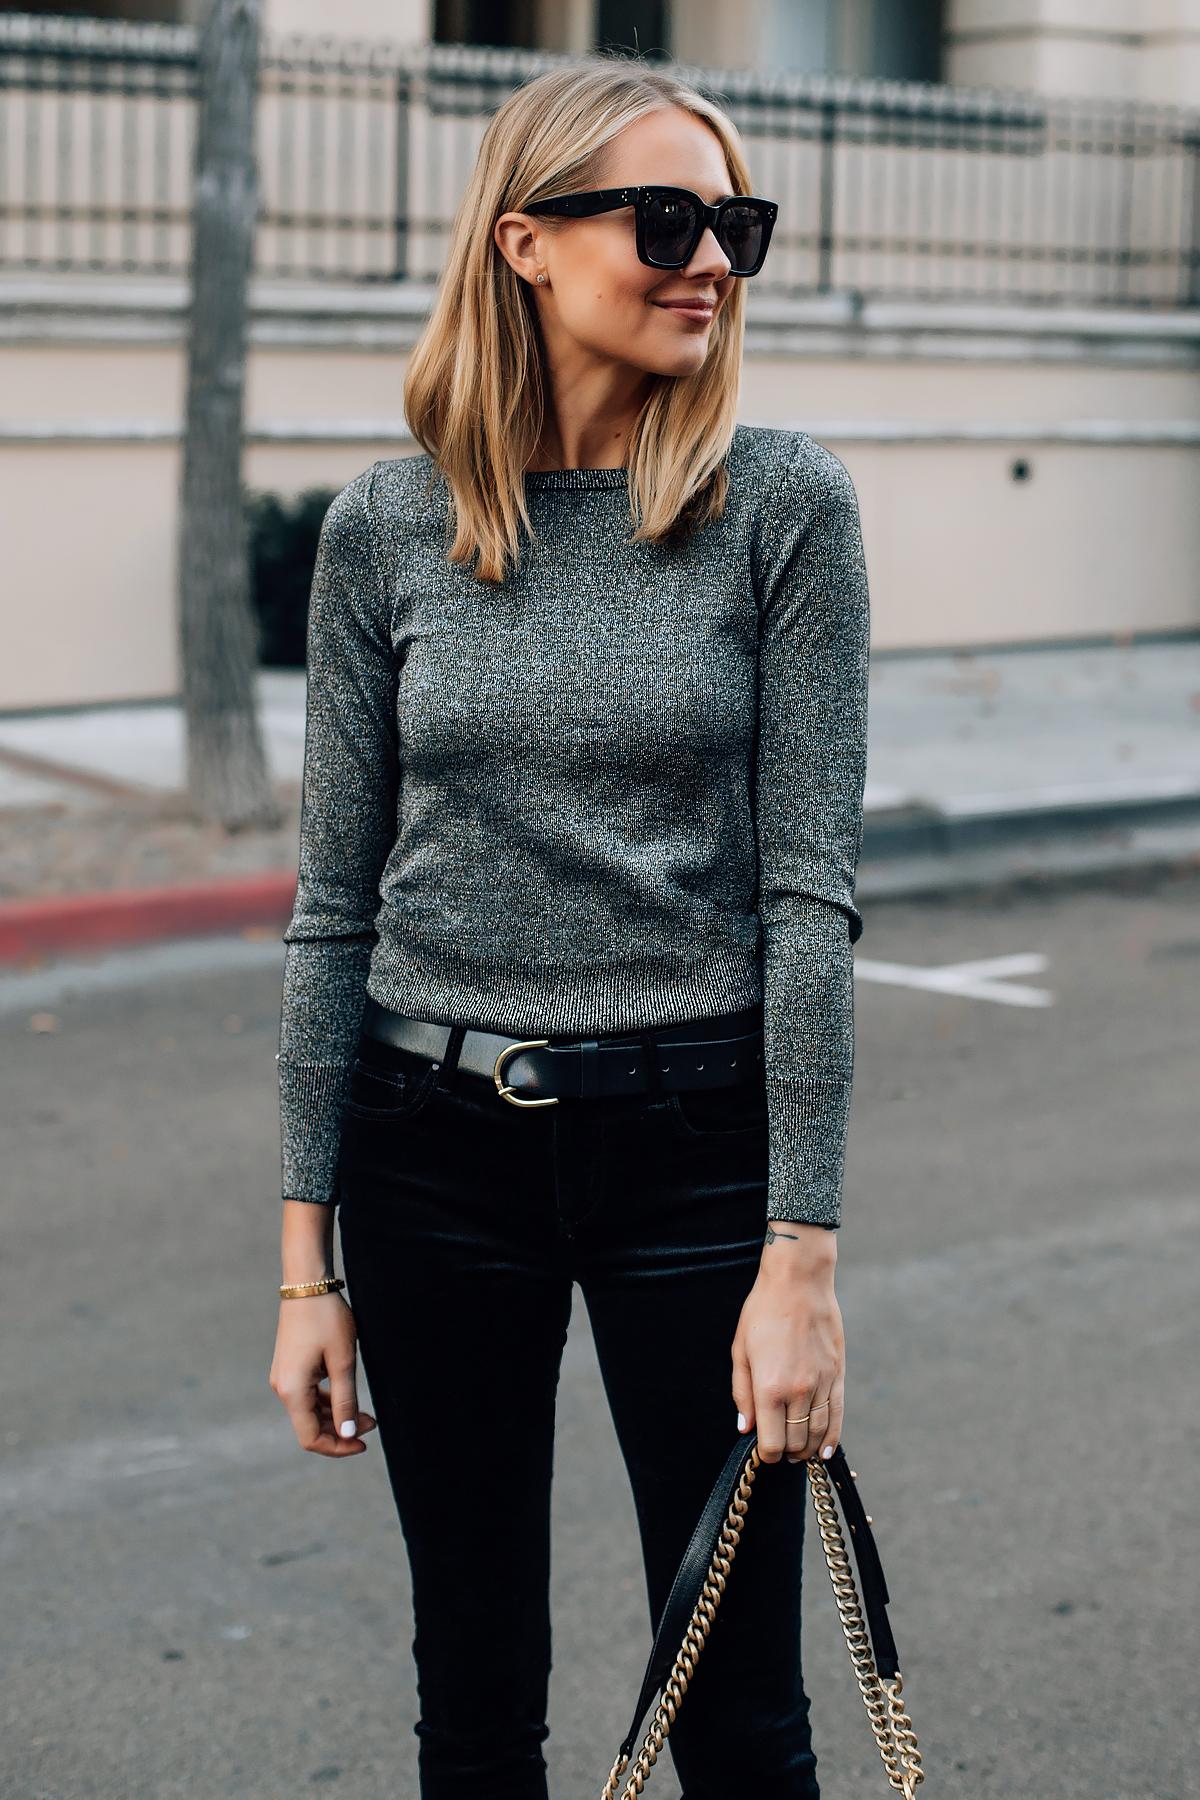 Blonde Woman Wearing Metallic Sweater Black Velvet Jeans Fashion Jackson San Diego Fashion Blogger Street Style